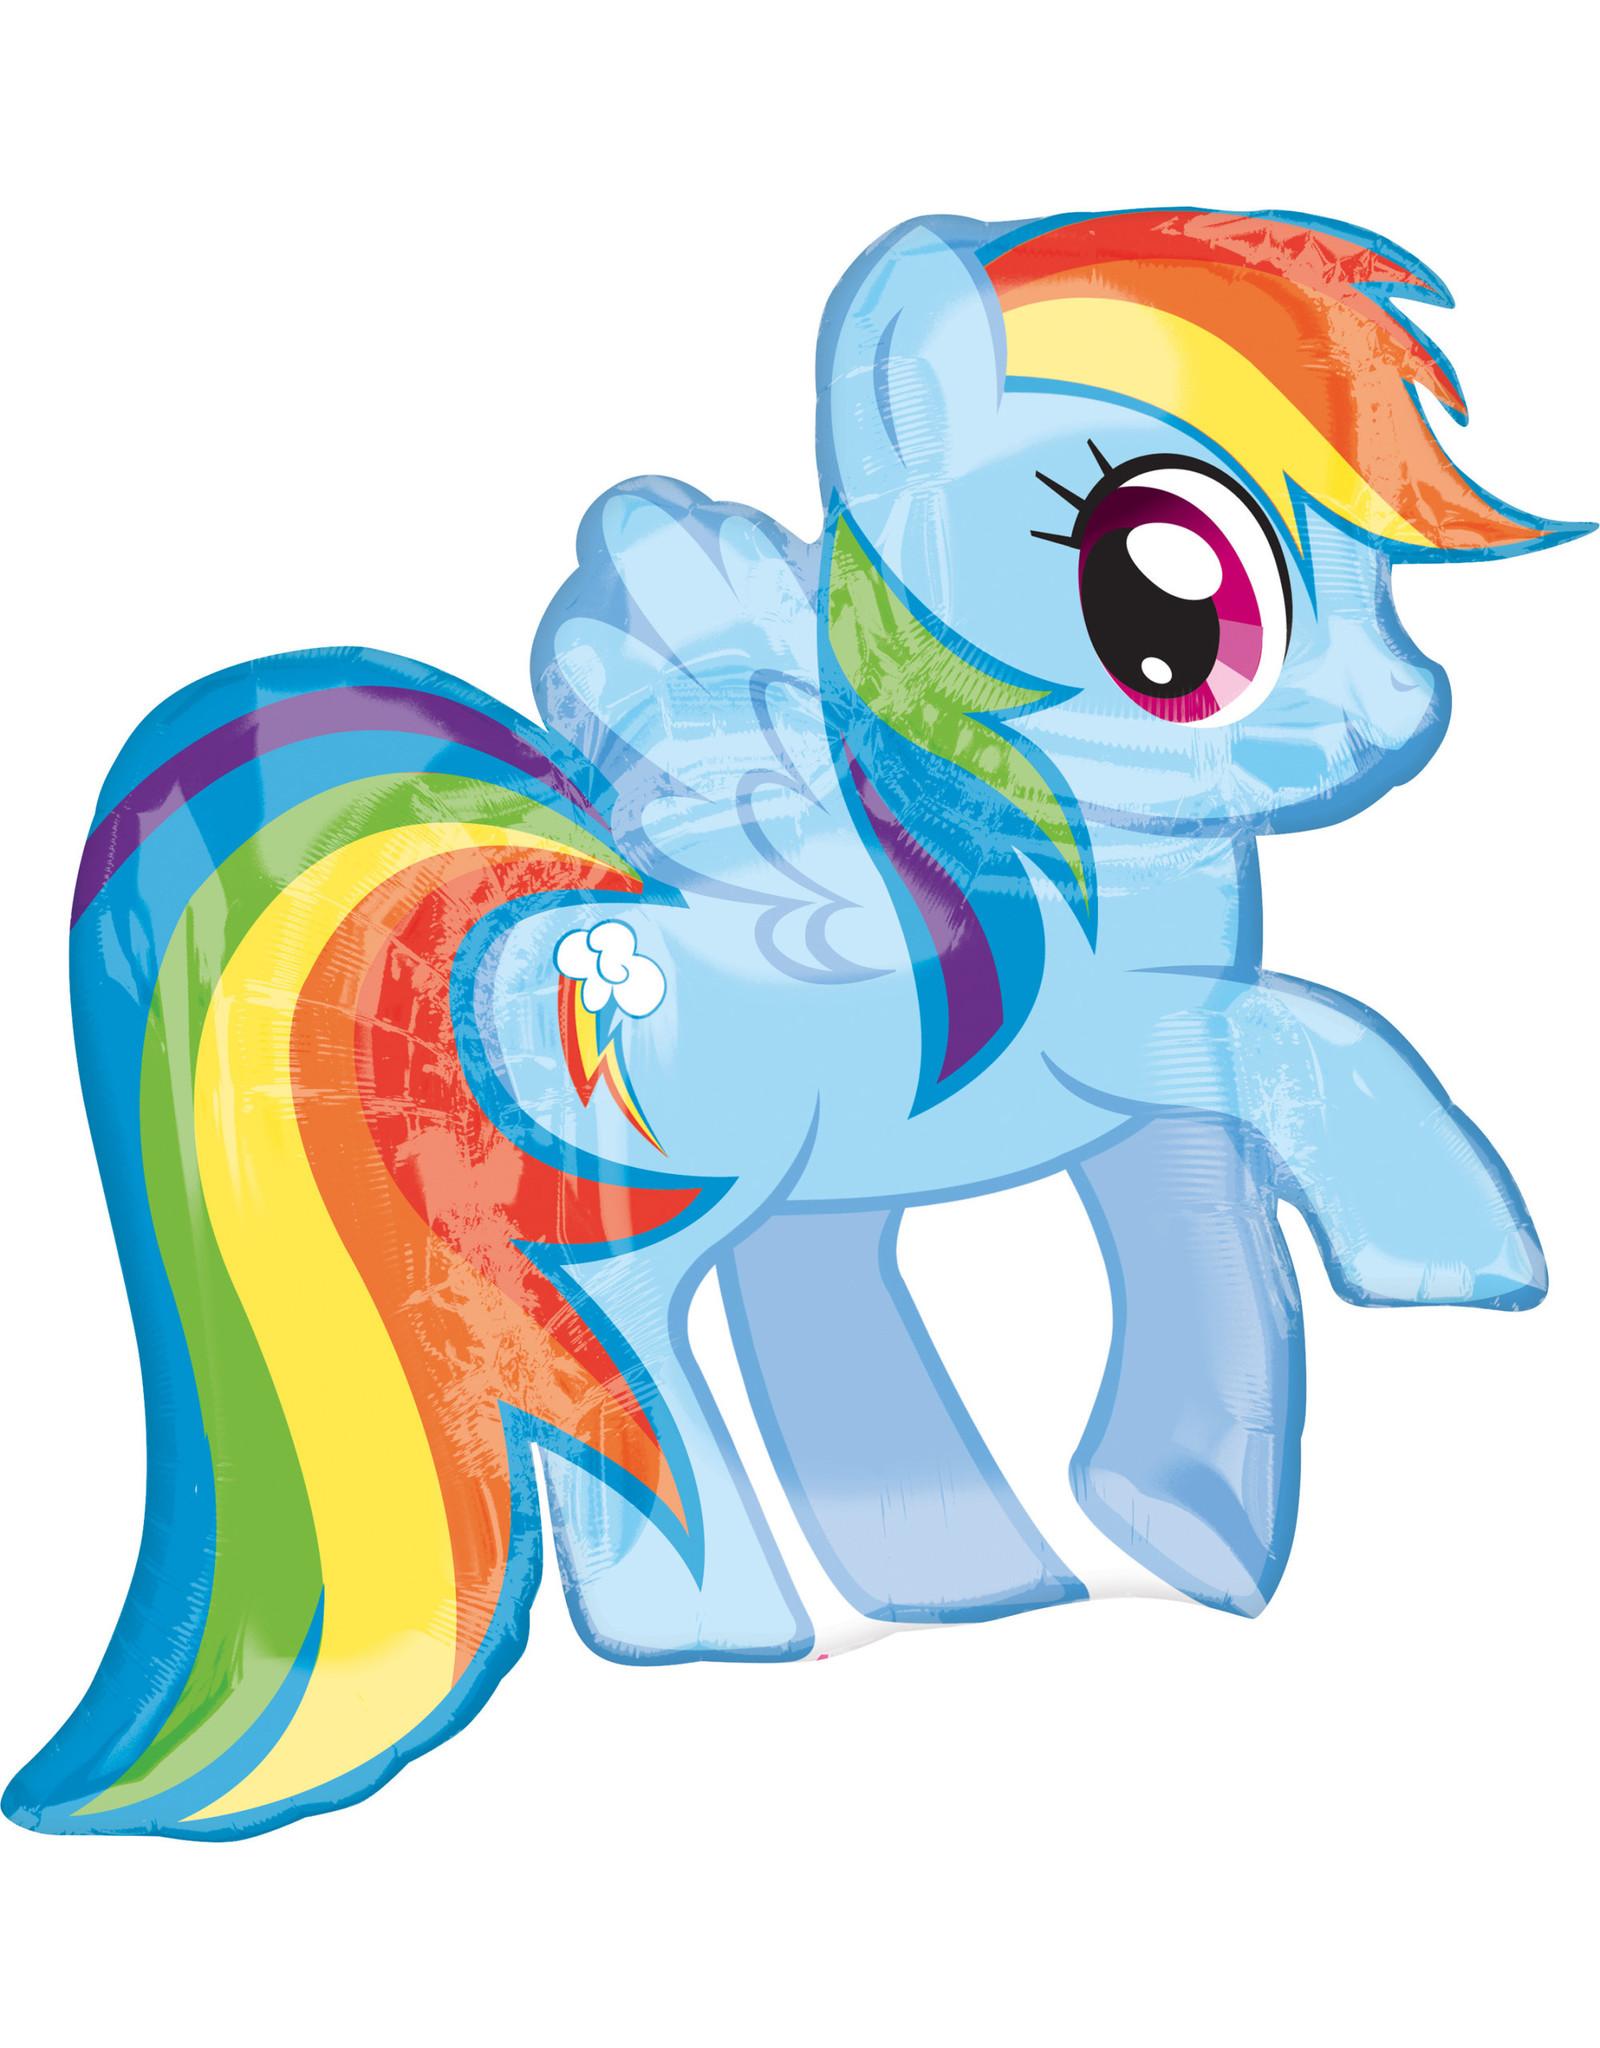 Amscan folieballon my little pony 71 cm x 68 cm